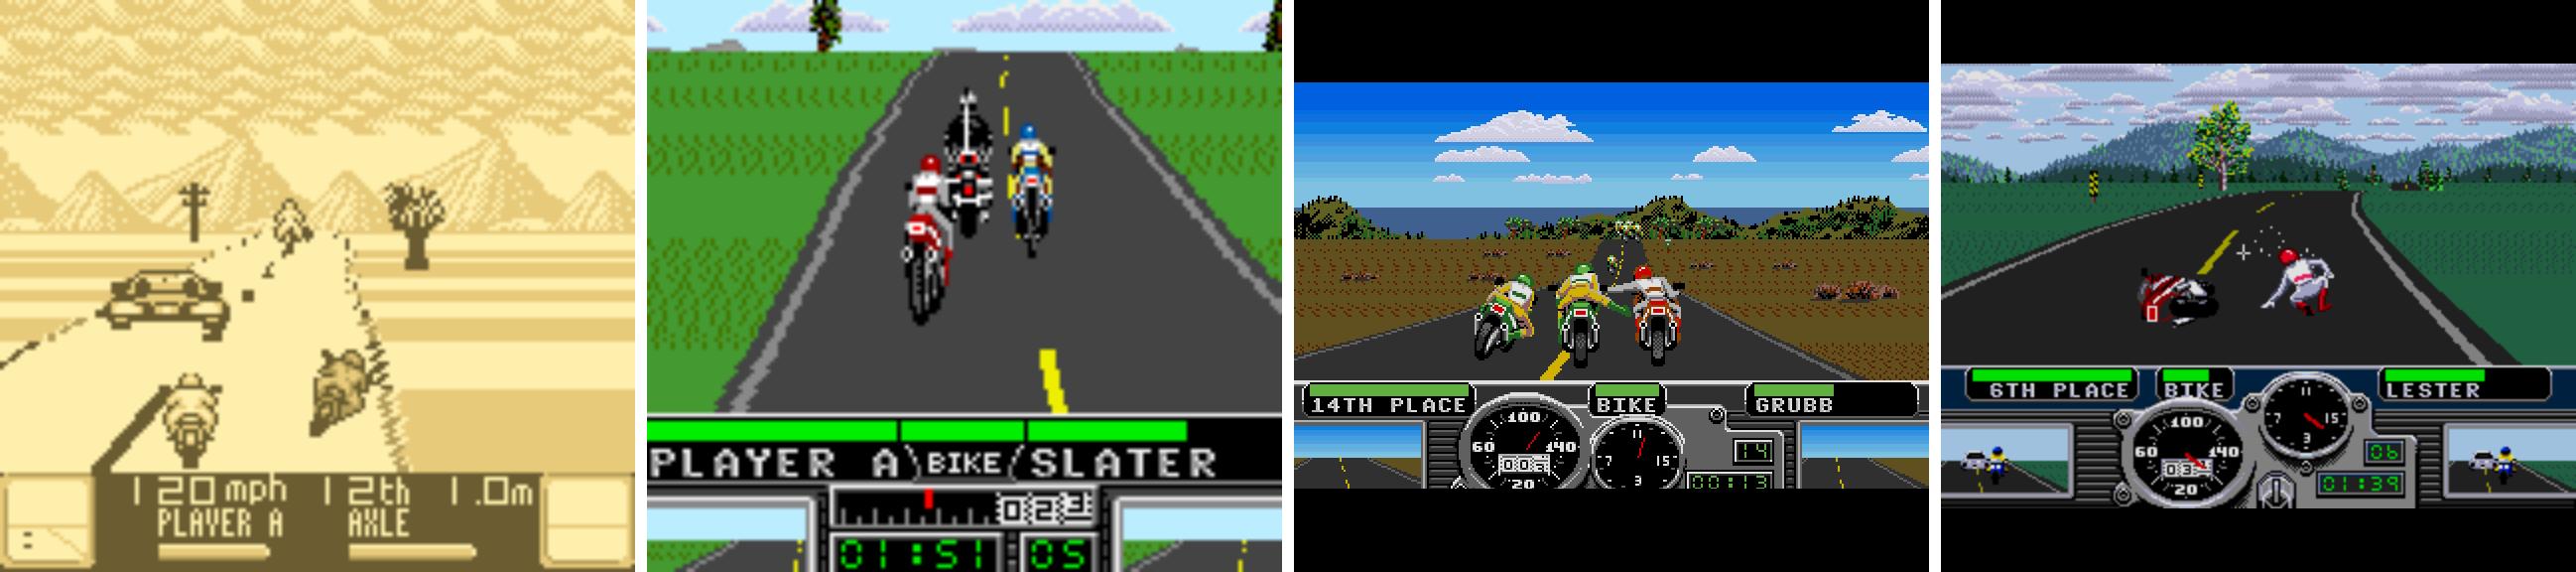 Image For Post | Game Boy - Game Gear - Amiga - Genesis